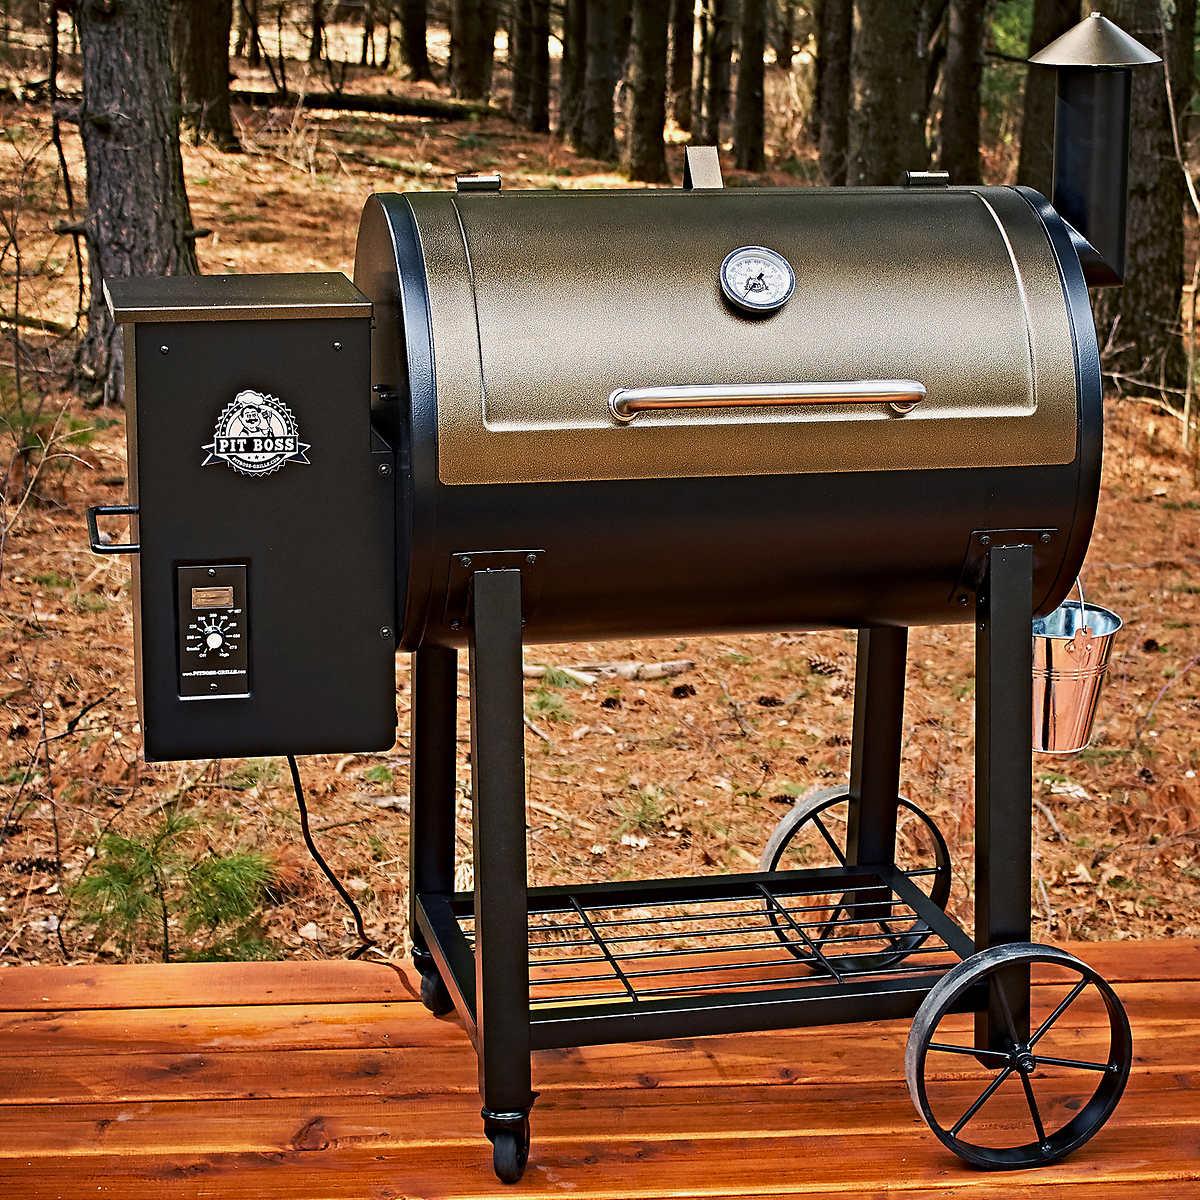 Pit Boss Wood Pellet Grill Amp Smoker Ebay